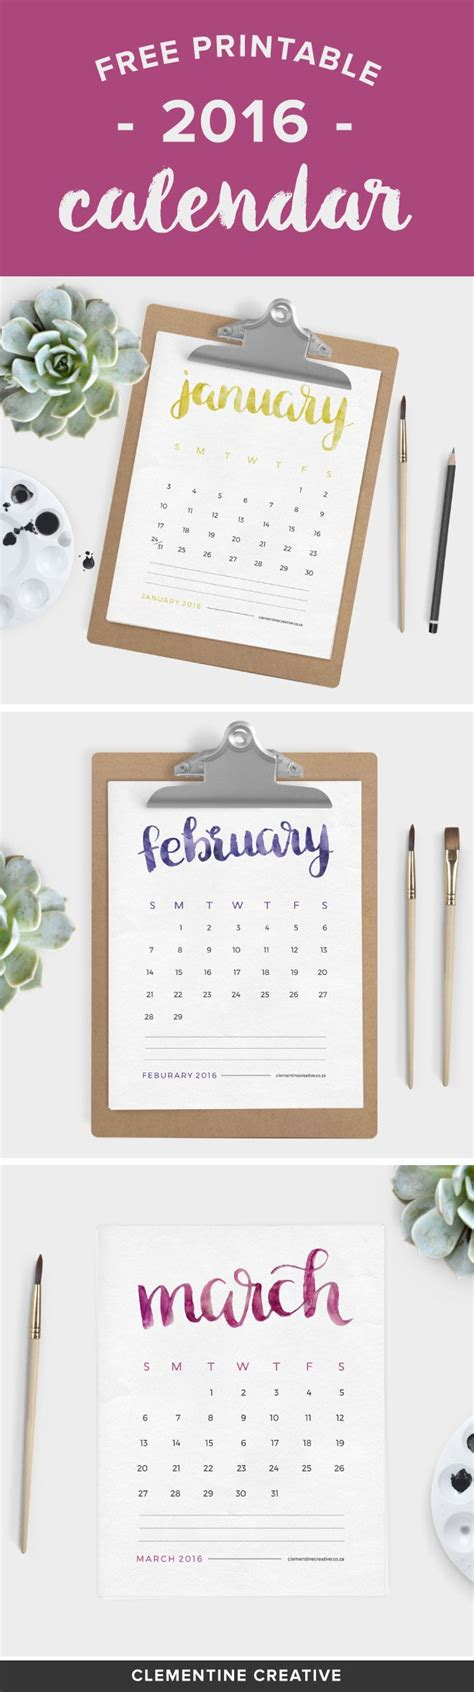 free printable desk planner 2016 free printable 2016 calendar by clementine creative 2016